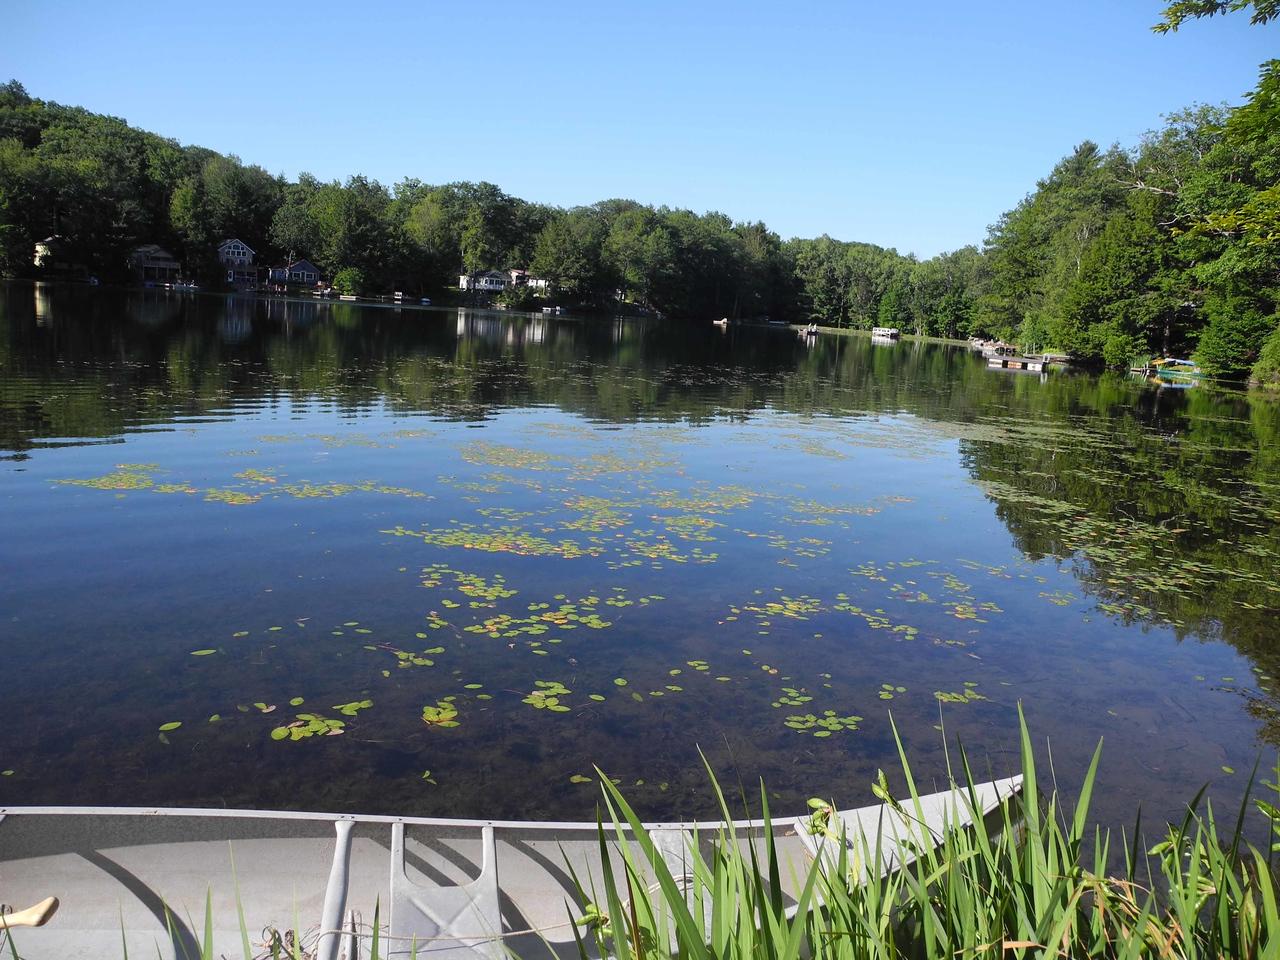 538 A perfect lake scene